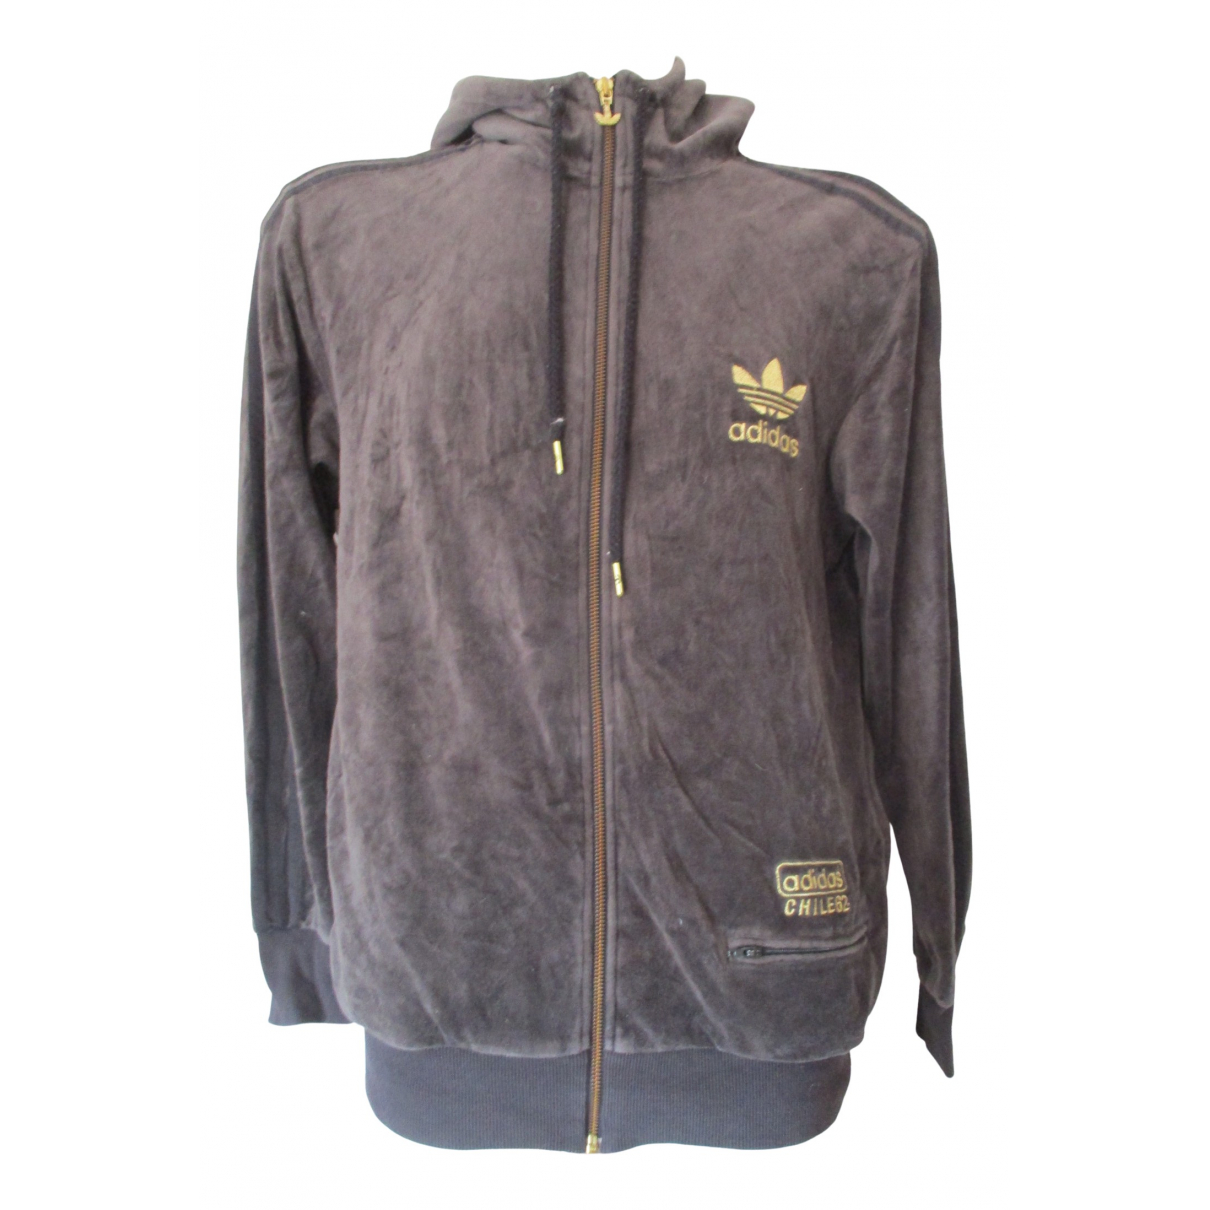 Adidas \N Brown Cotton Knitwear & Sweatshirts for Men M International